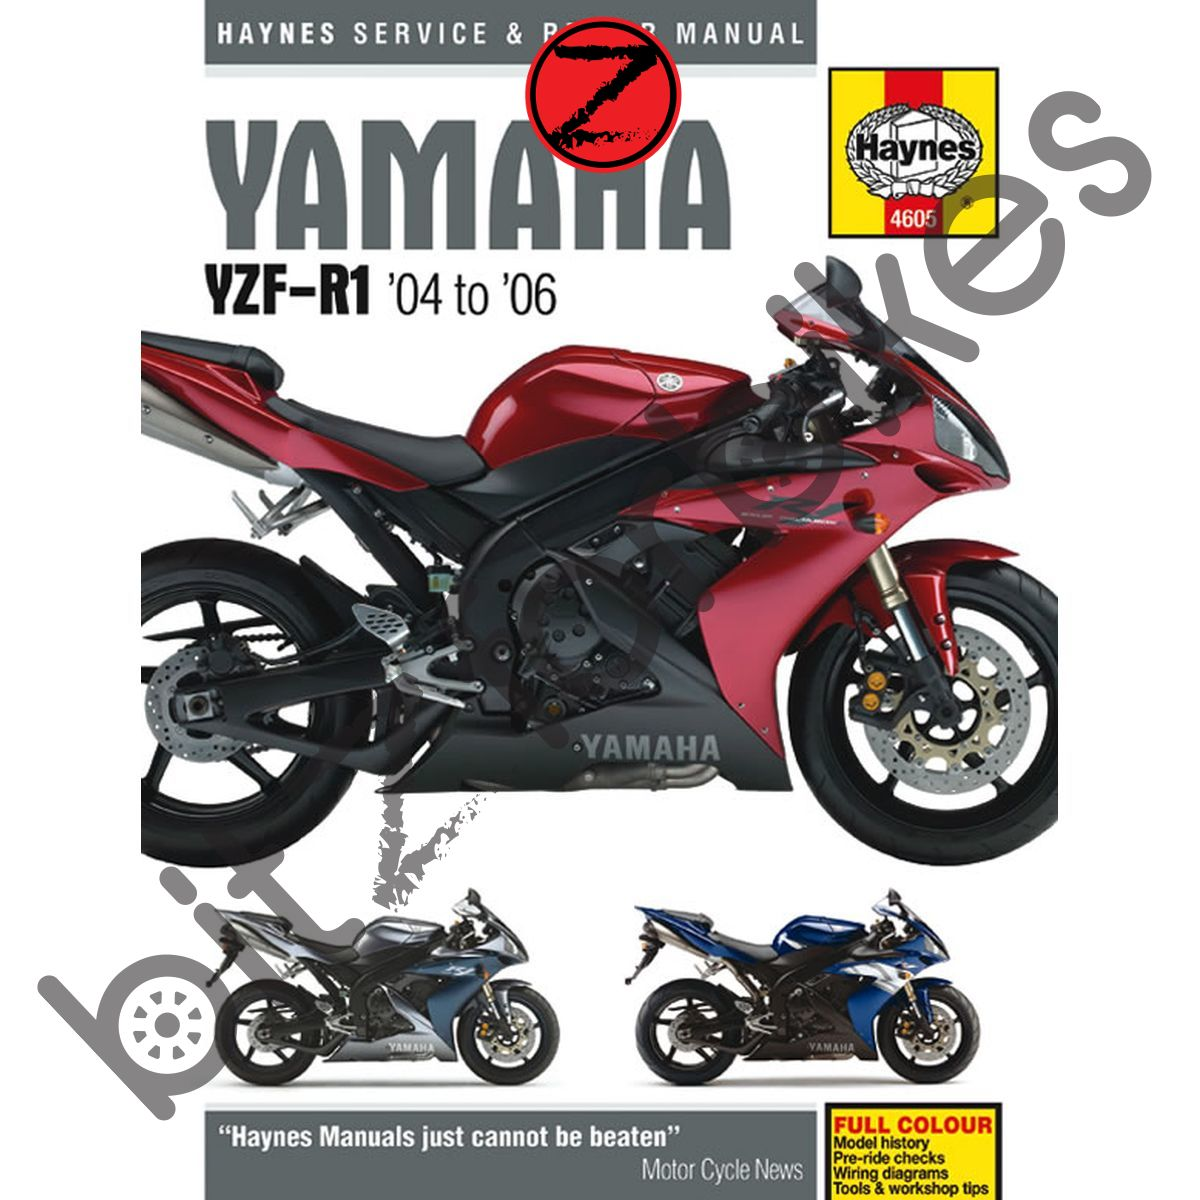 2005 yamaha yz250 service manual